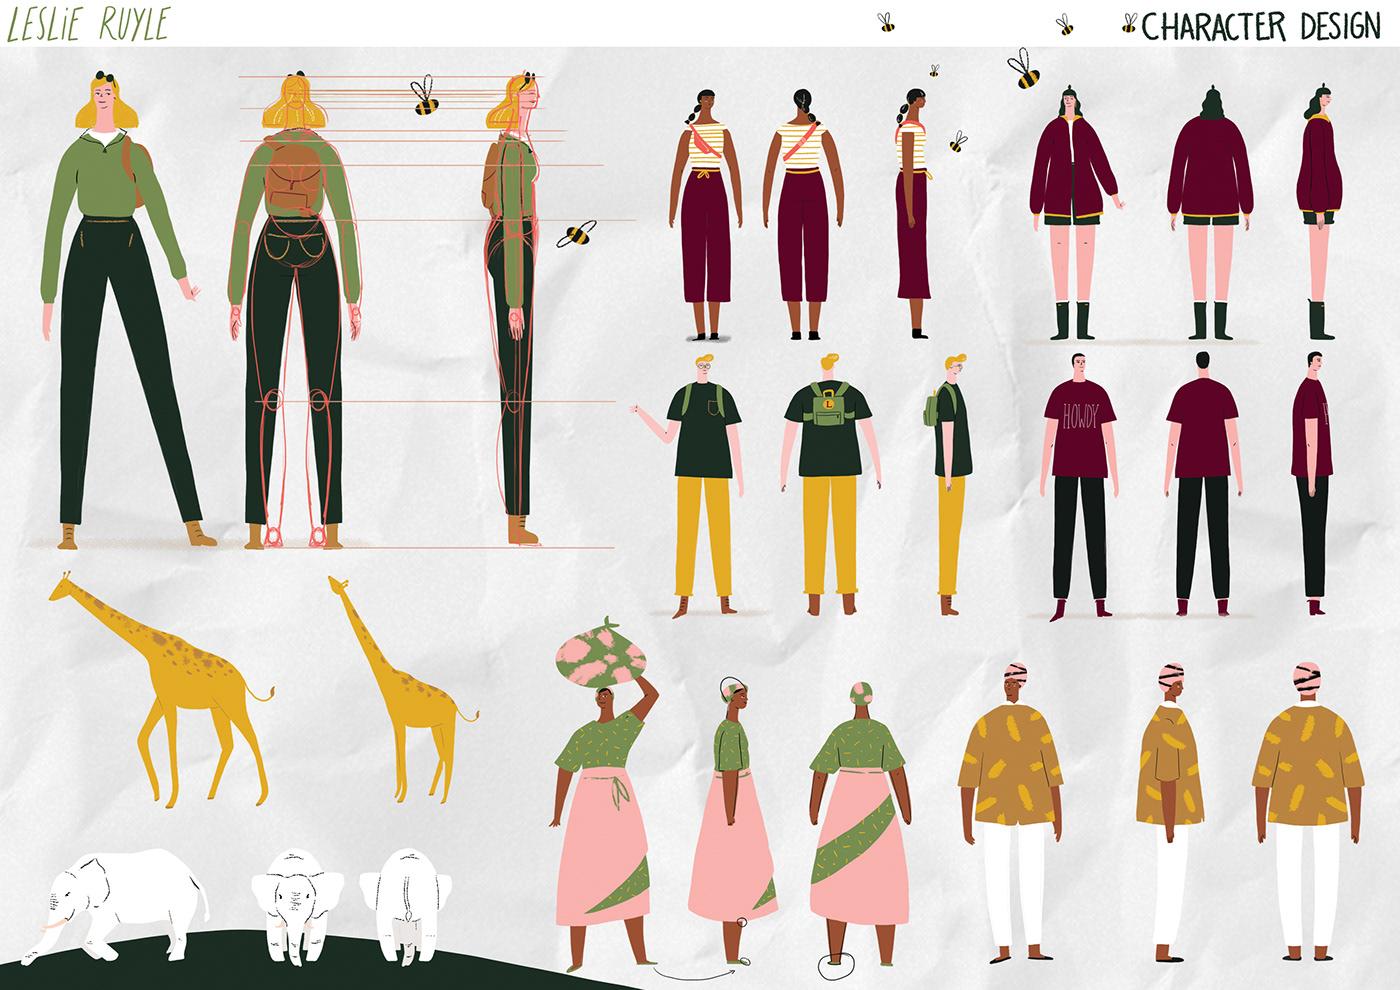 animation  motion graphics  ILLUSTRATION  Cel Animation Character design  short film narrative africa elephants example